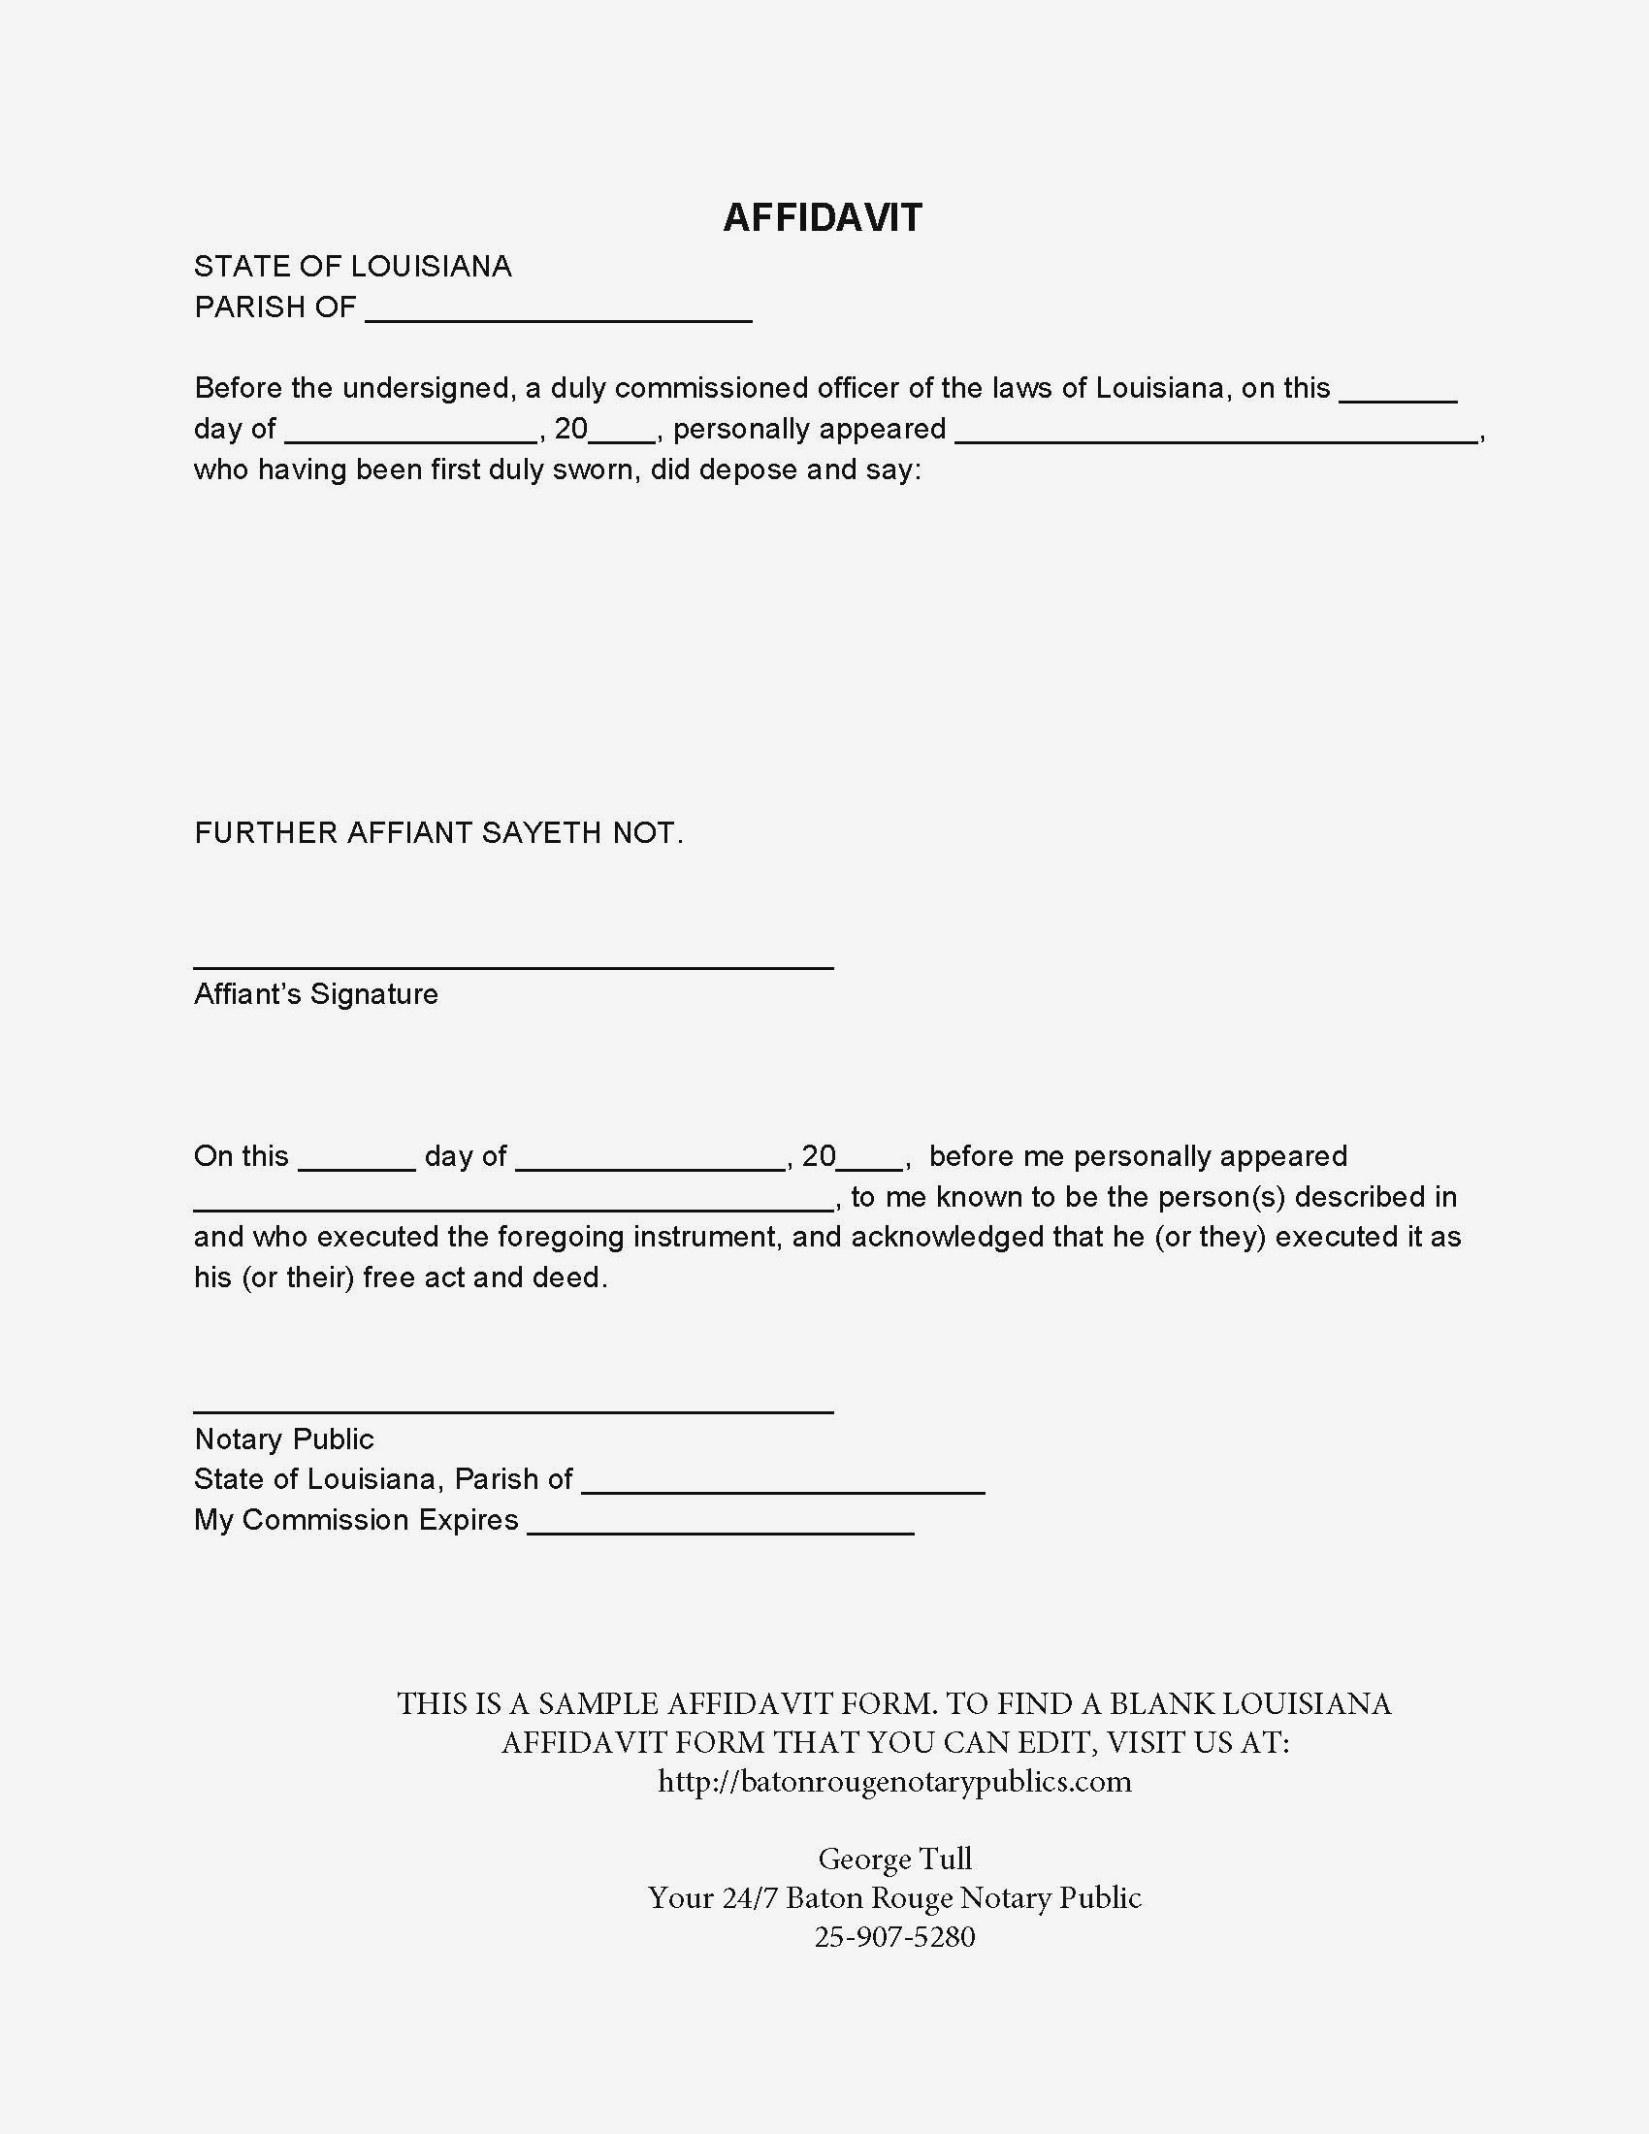 Blank Louisiana Affidavit | Baton Rouge Notary Publics – Sample - Free Printable Divorce Papers For Louisiana